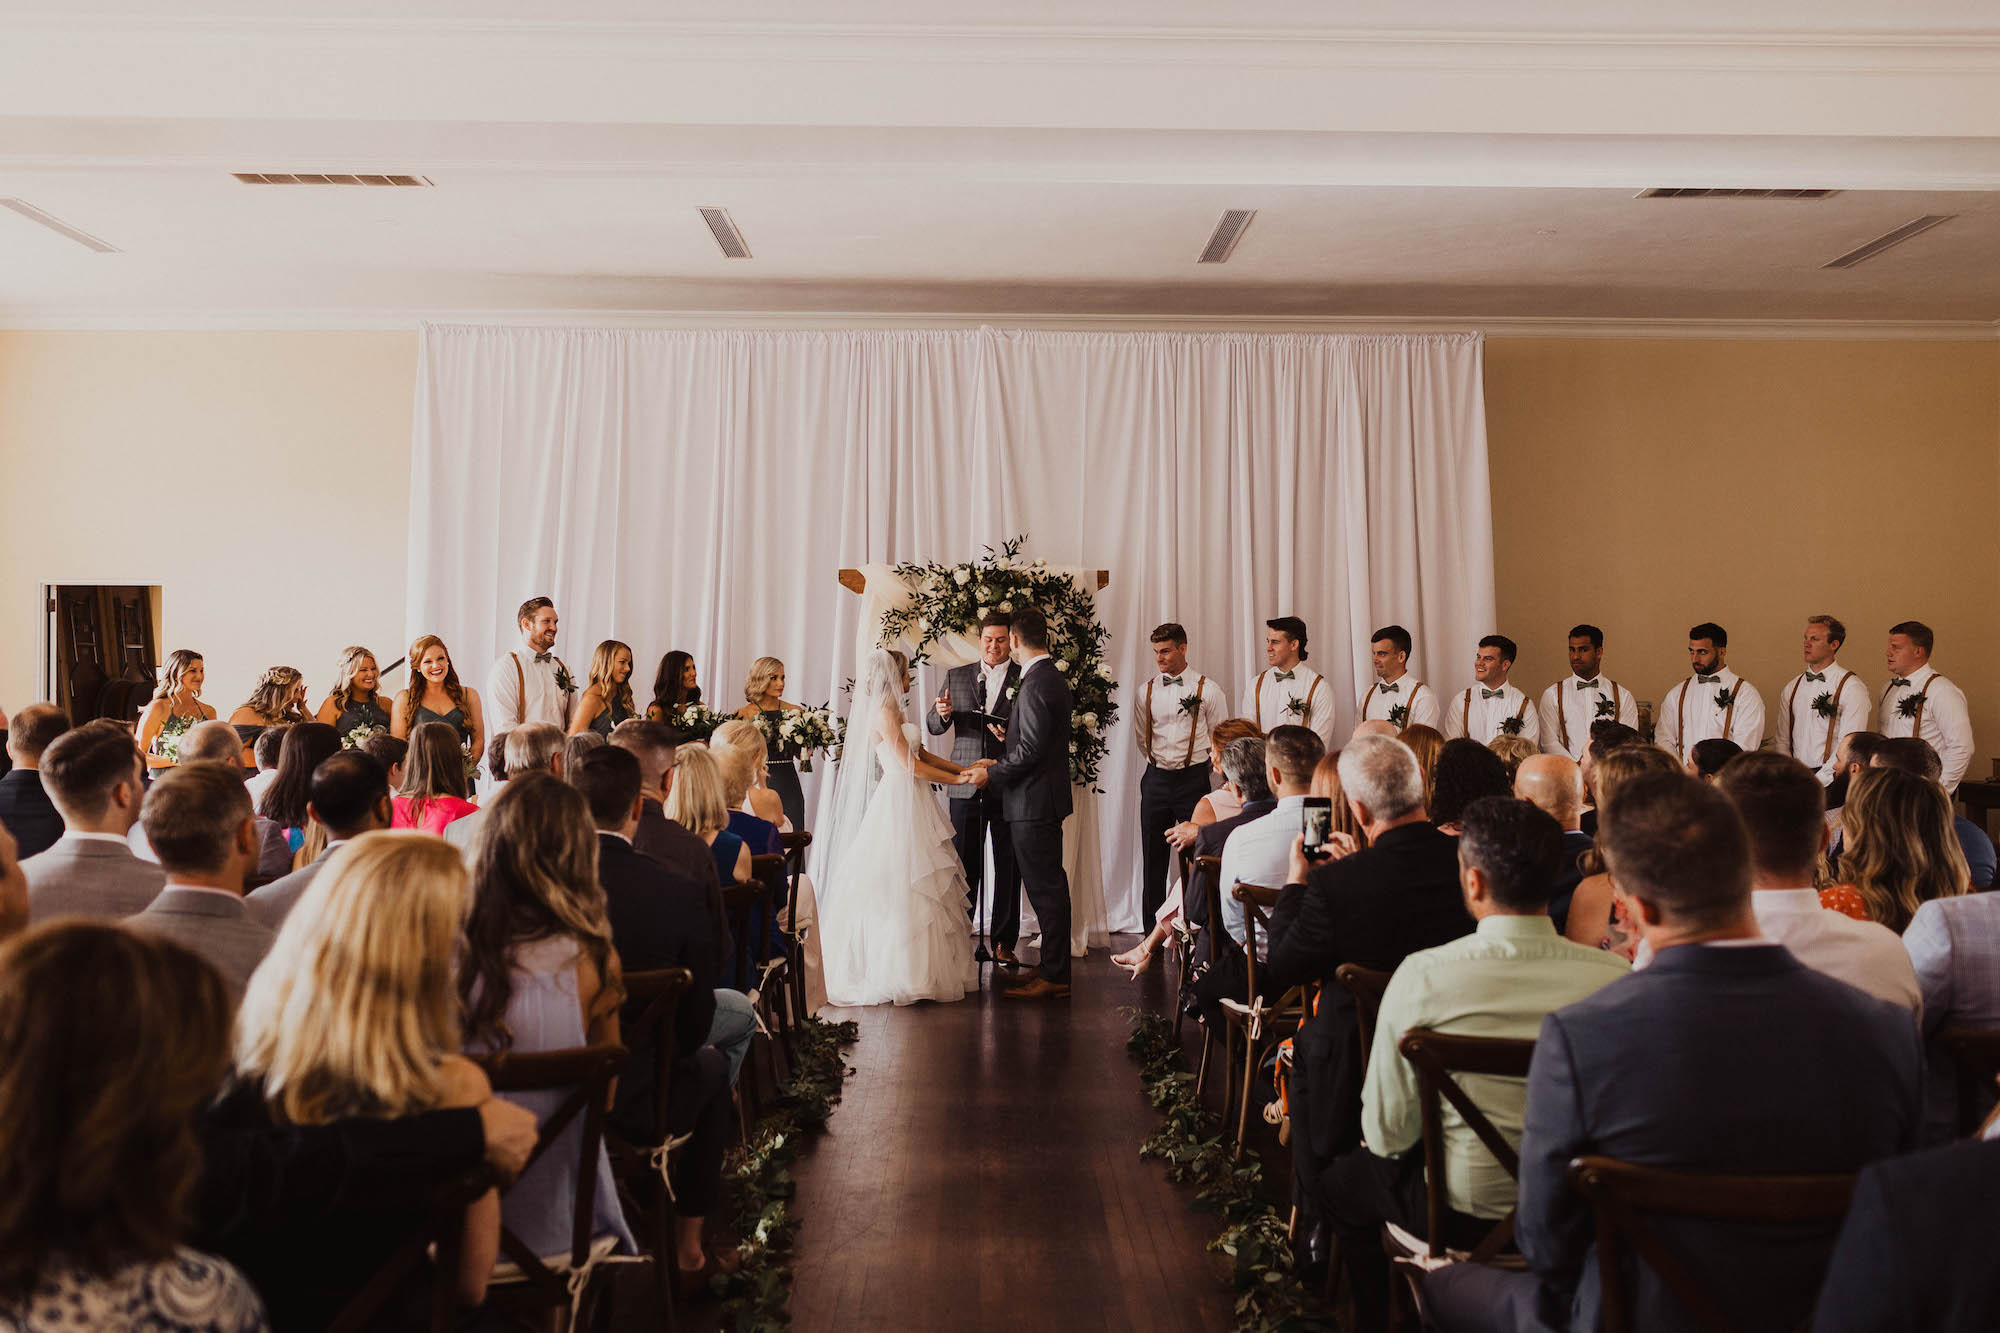 Bride and Groom Exchanging Wedding Vows During Ceremony Portrait | Tampa Bay Wedding Venue The Orlo